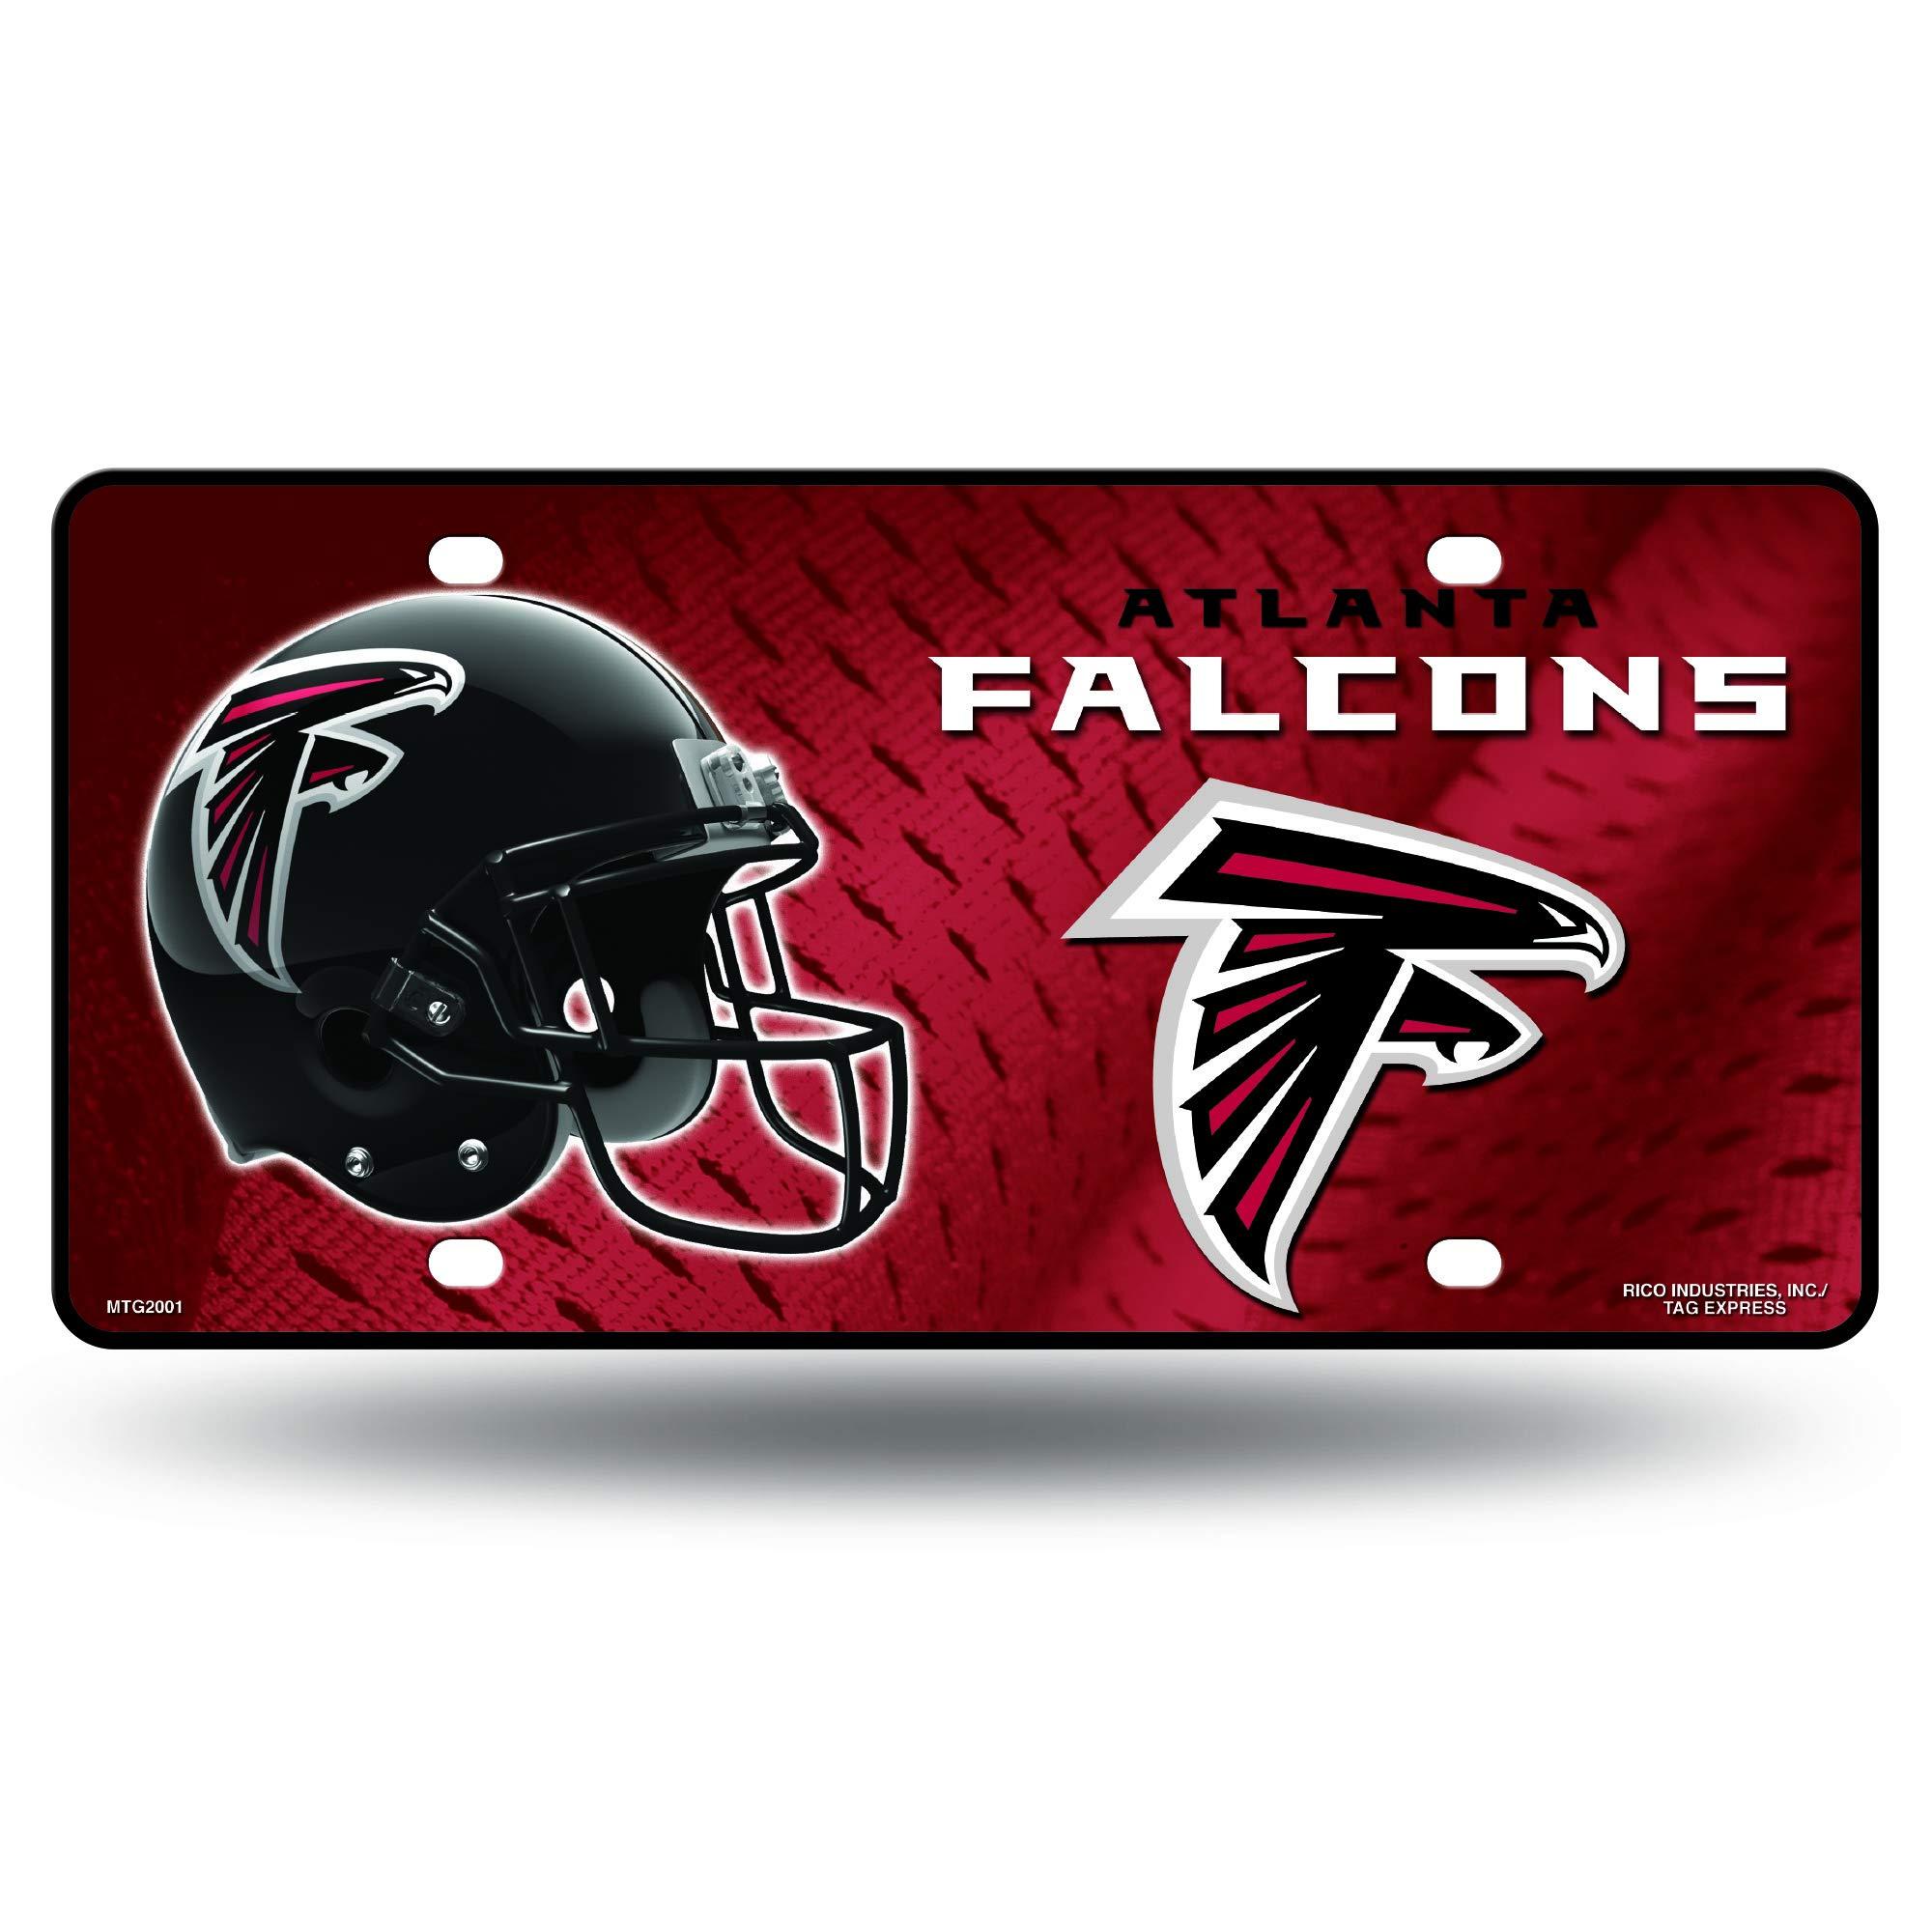 NFL Atlanta Falcons Metal License Plate Tag